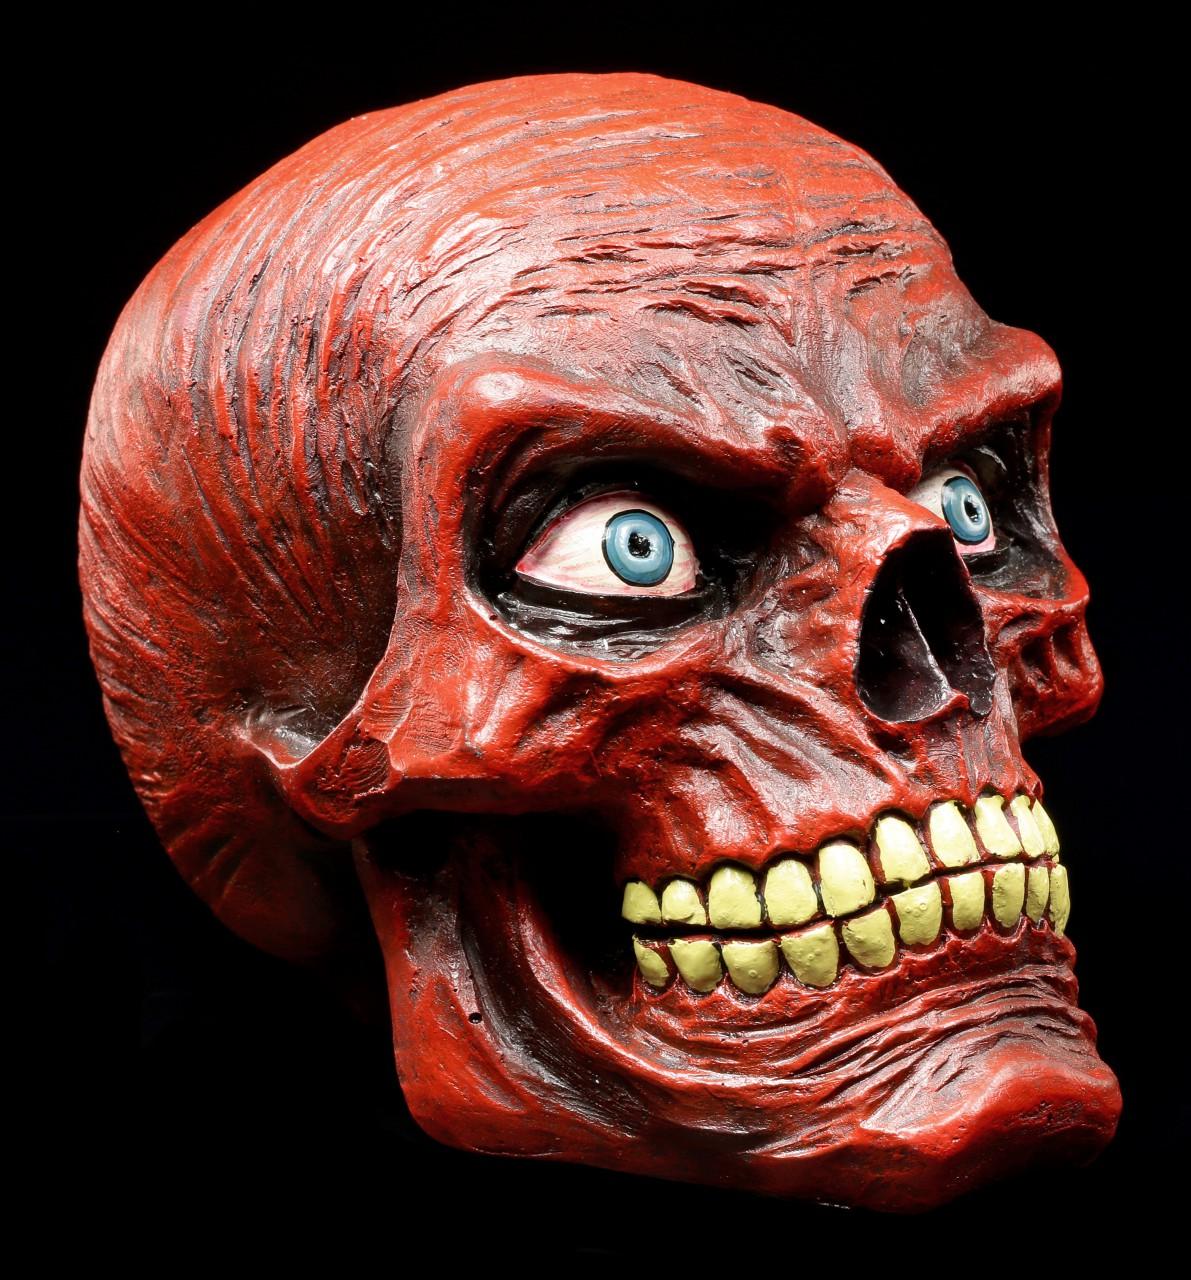 Menschlicher Totenkopf - Red Skull